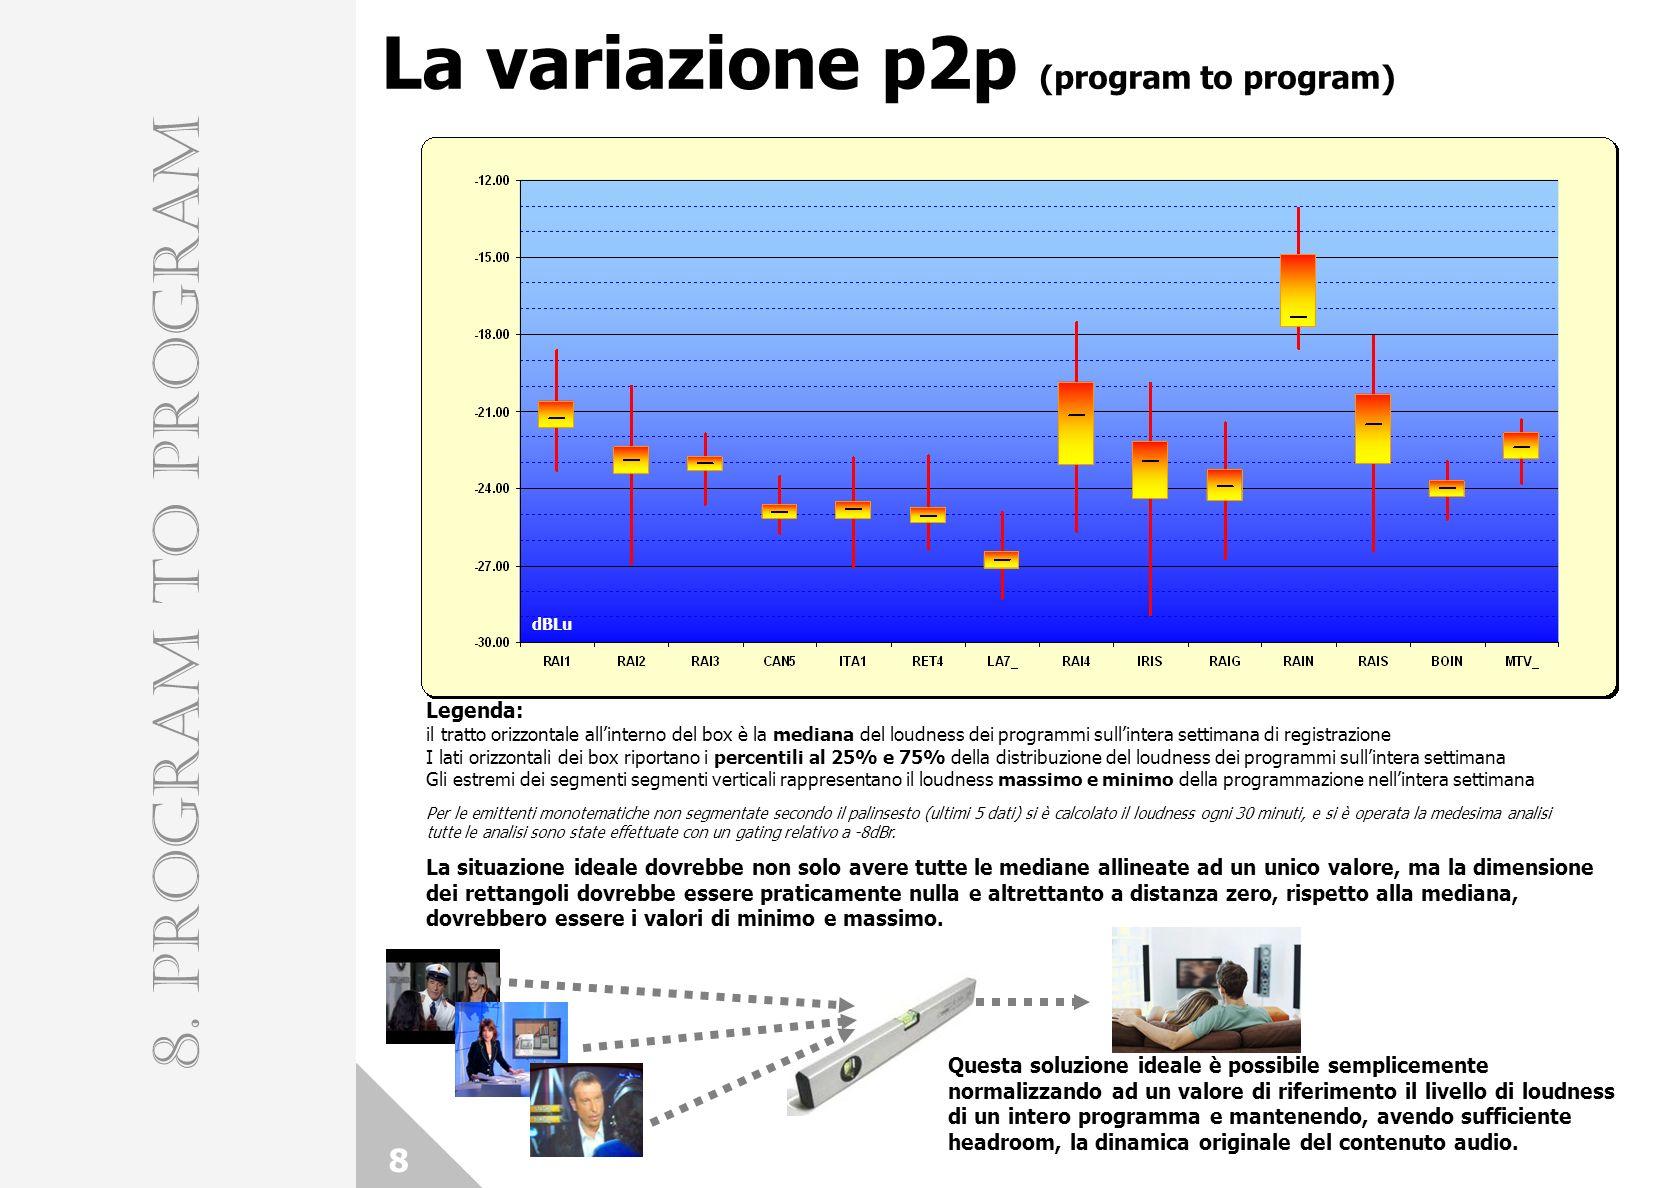 La variazione p2p (program to program) 8 8.